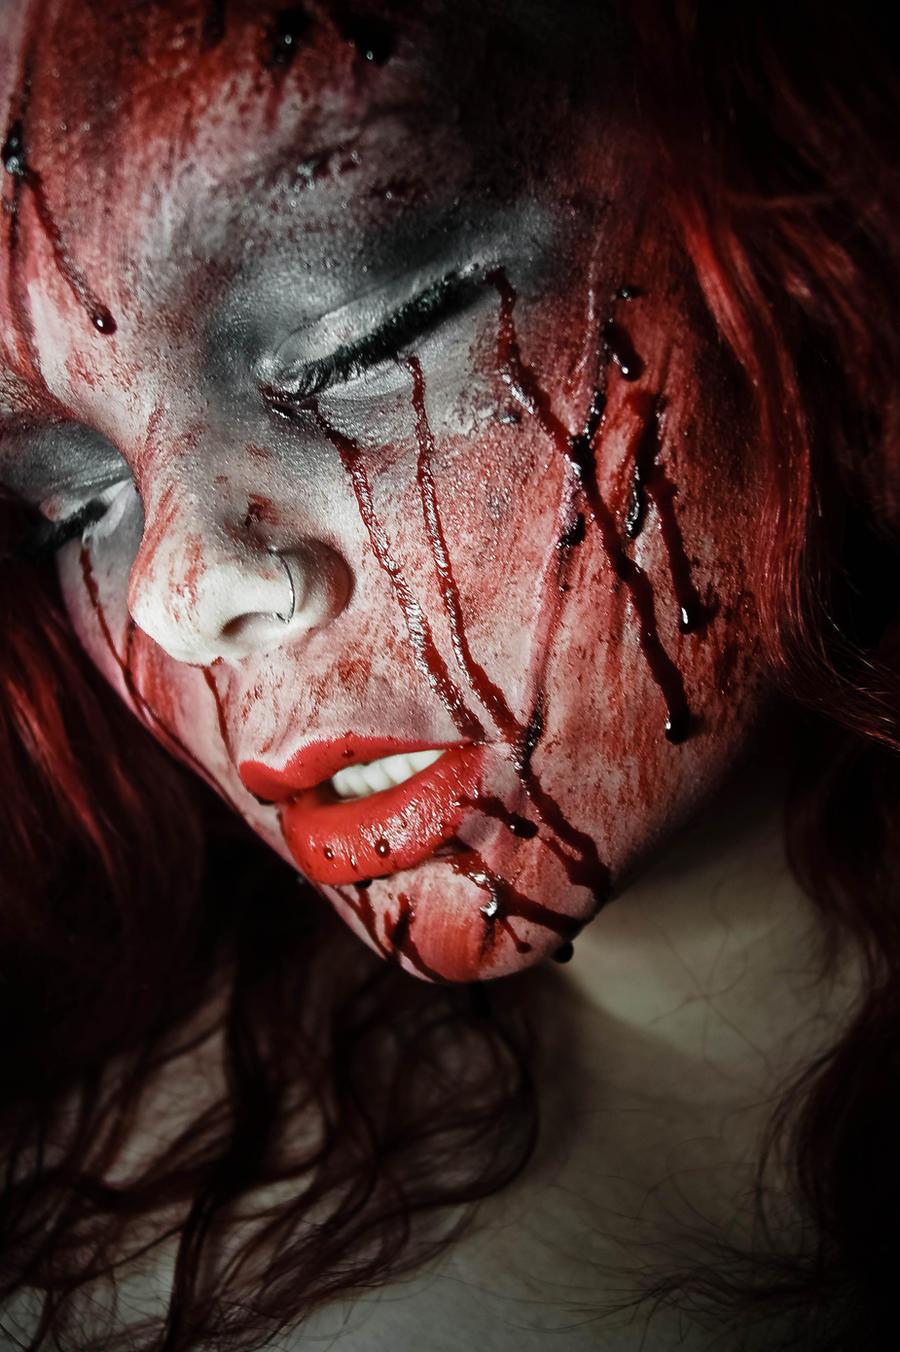 She Bleeds. by CrimsonnOnyxx